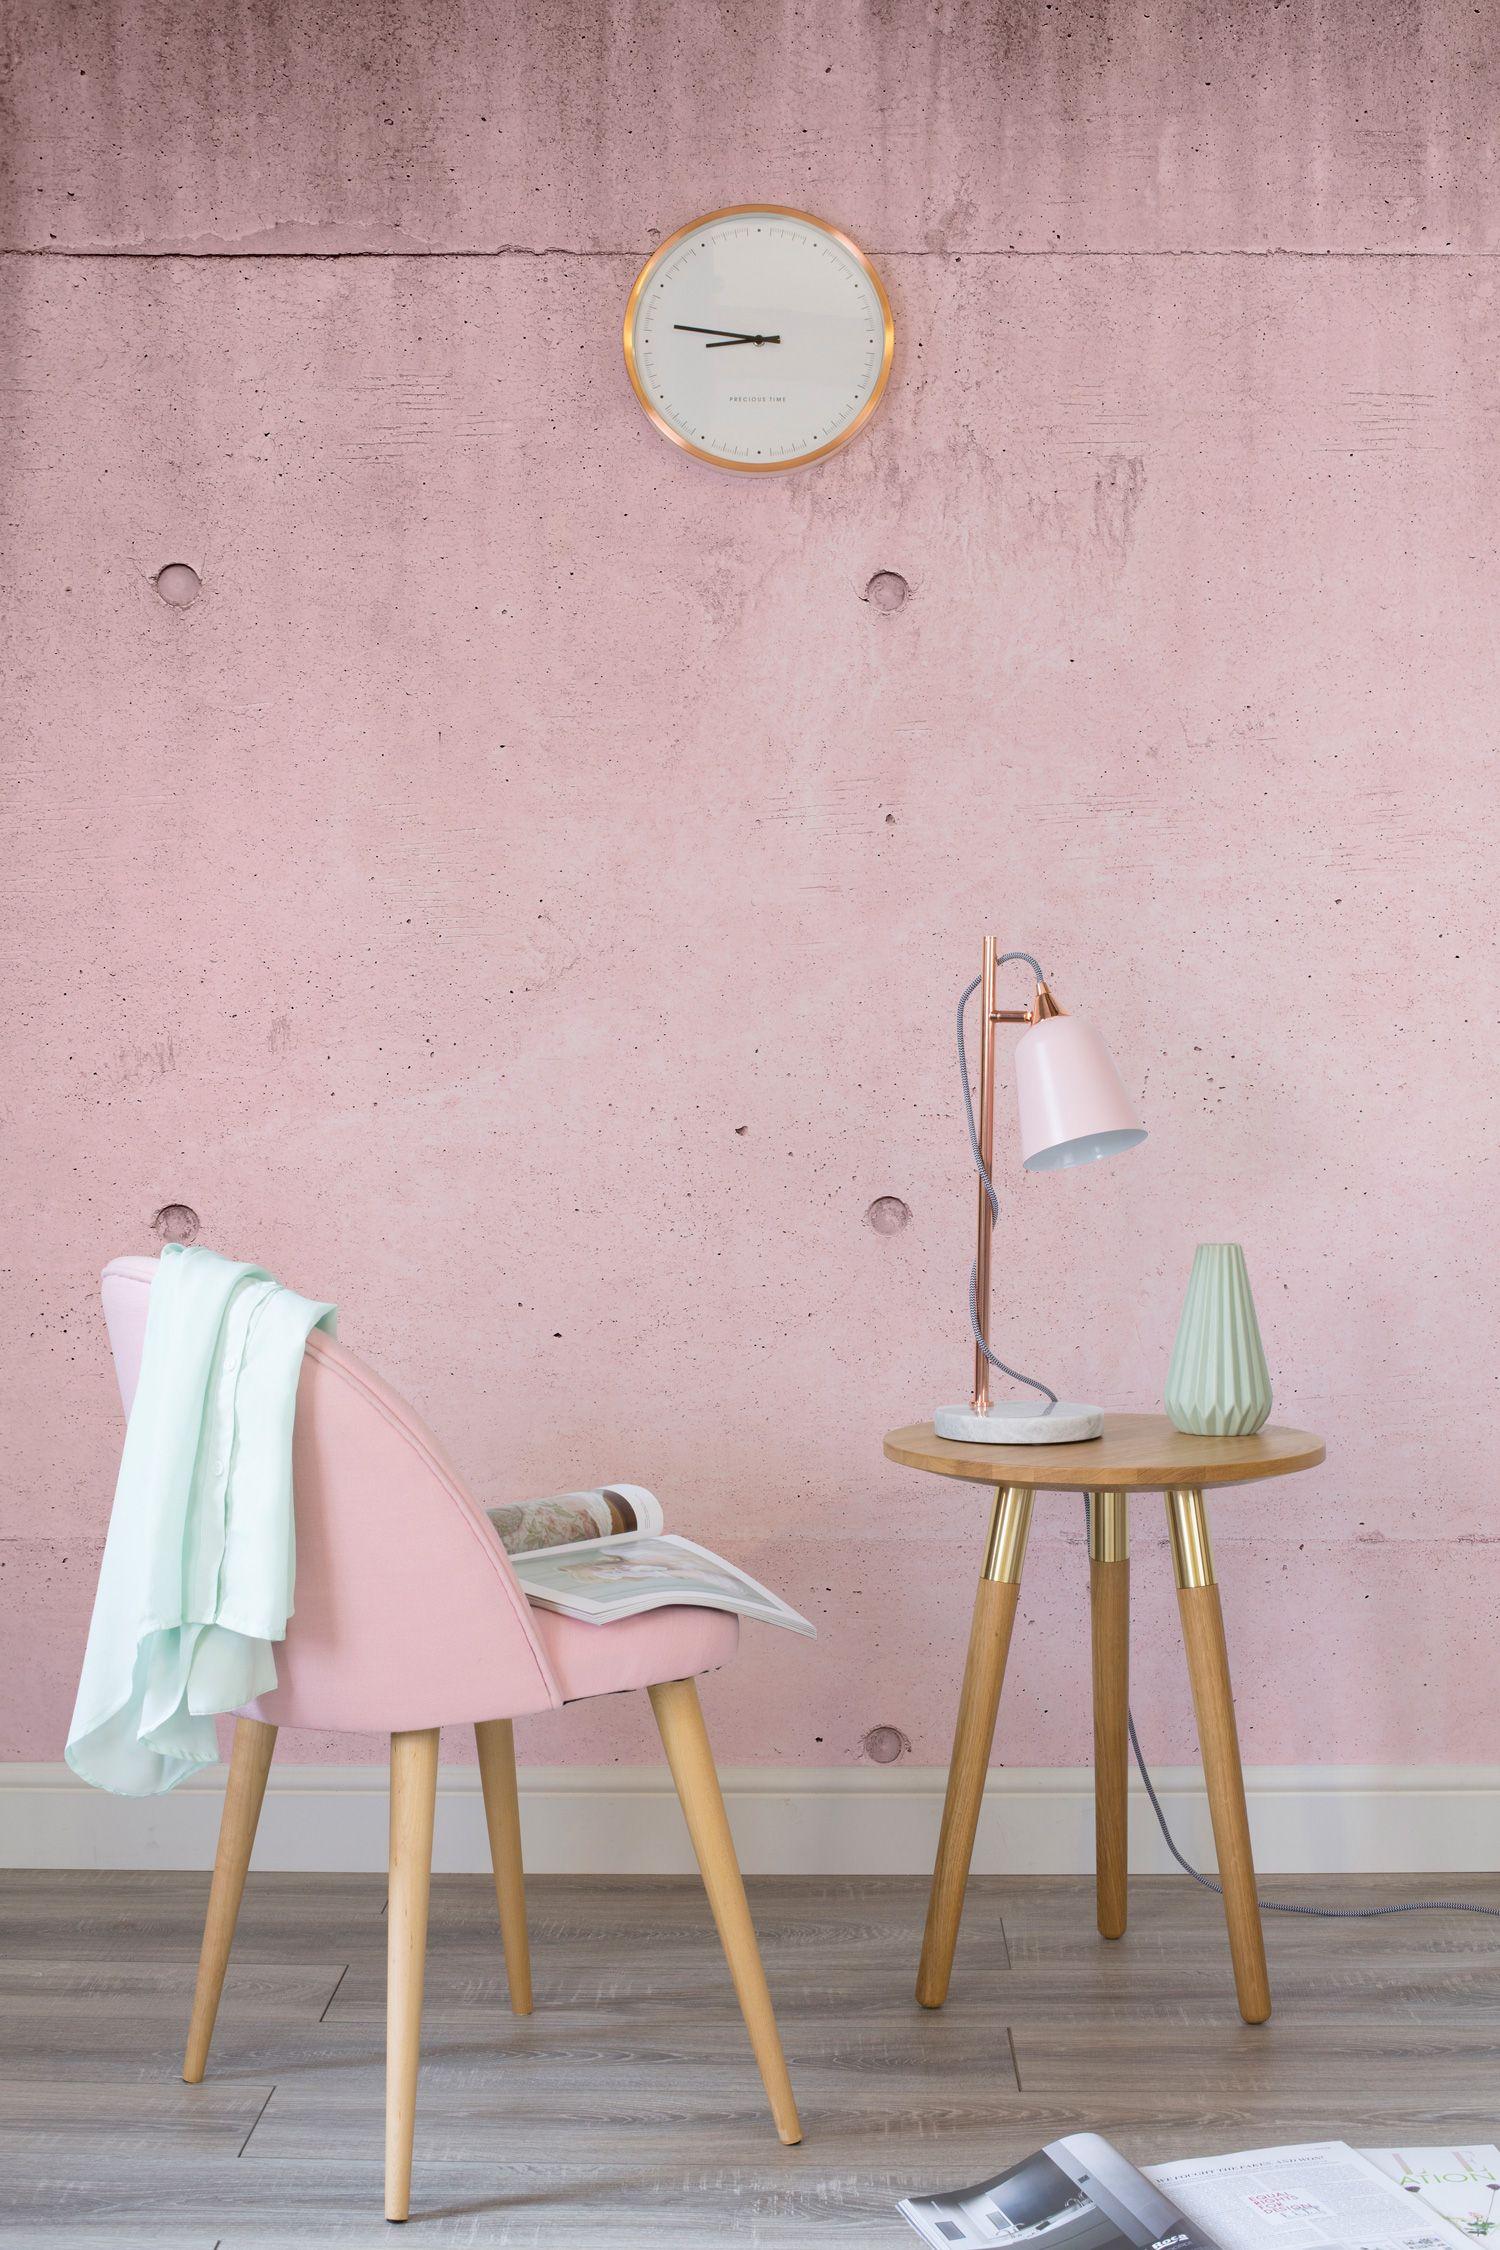 Pink Modern Concrete Block Wallpaper Mural Murals Wallpaper In 2020 Contemporary Wallpaper Living Room Living Room Design Diy Wallpaper Living Room